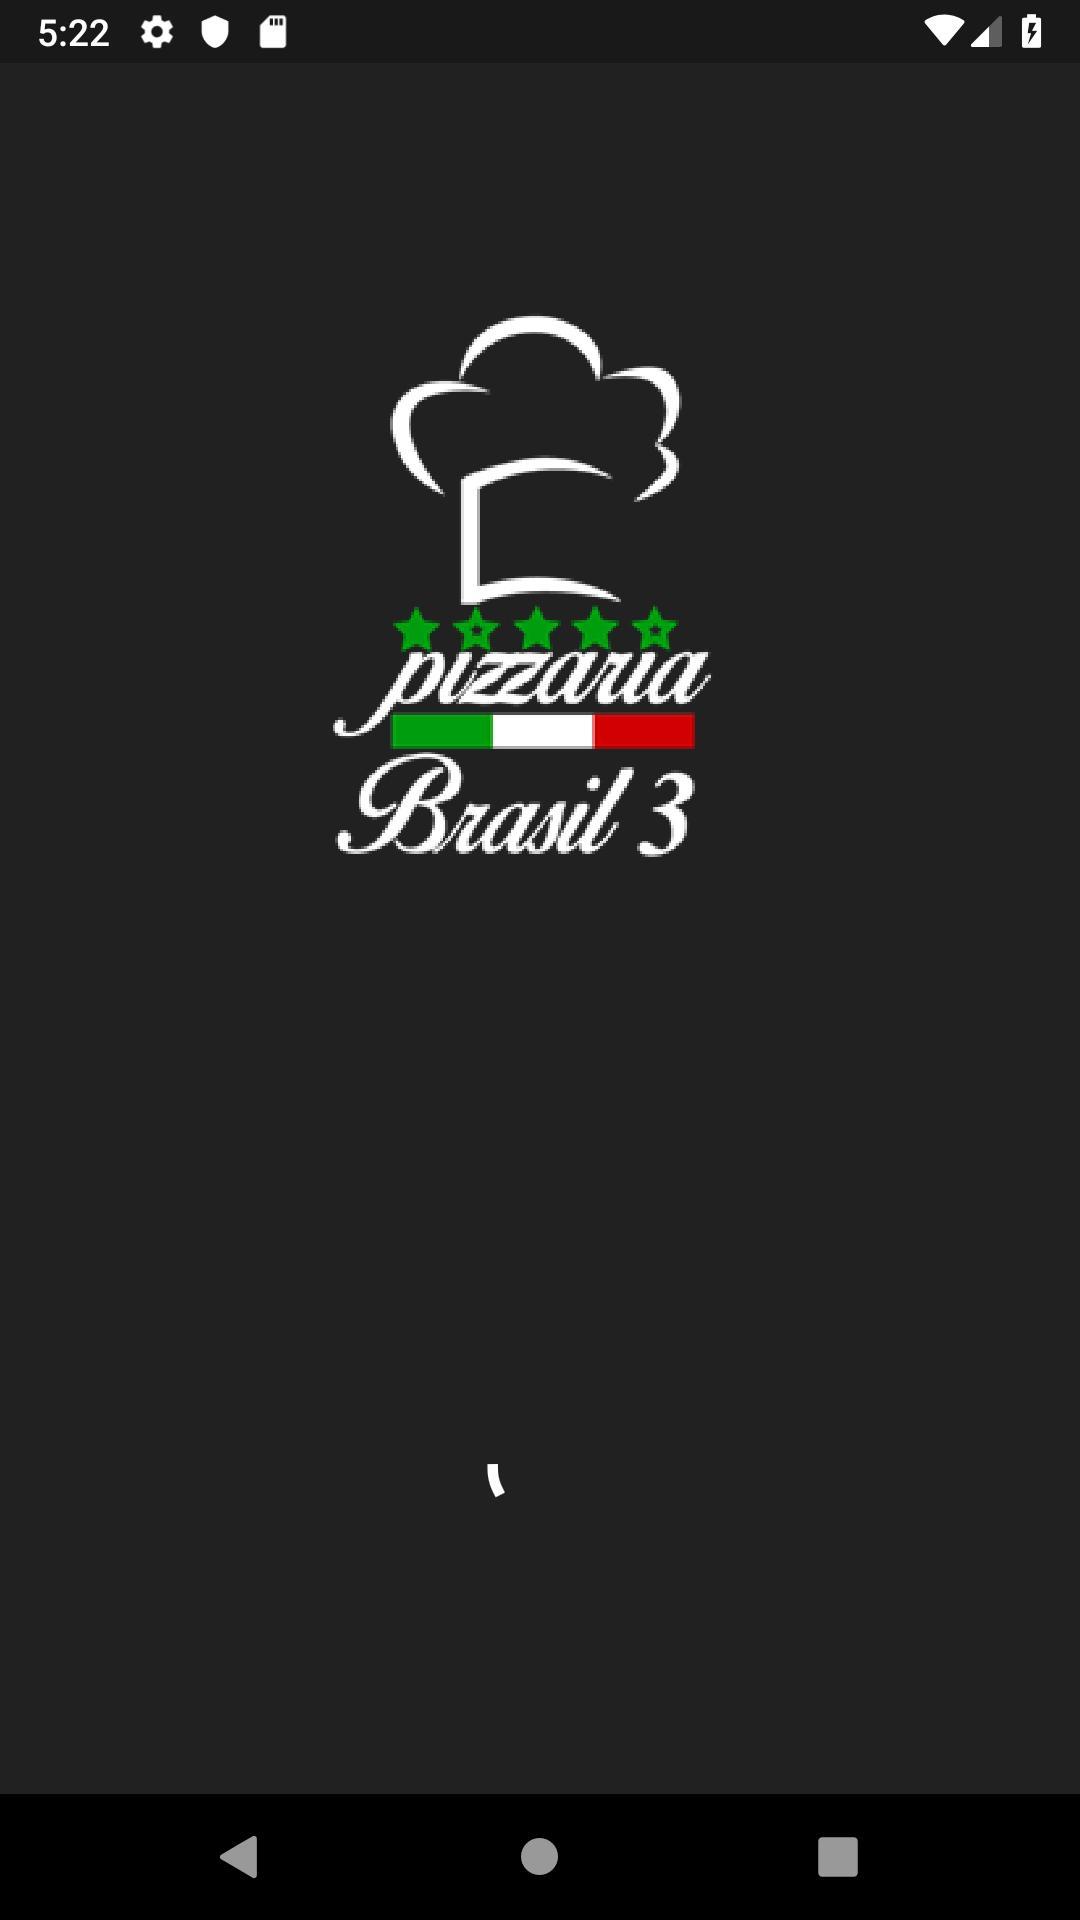 Pizzaria Brasil 3 poster